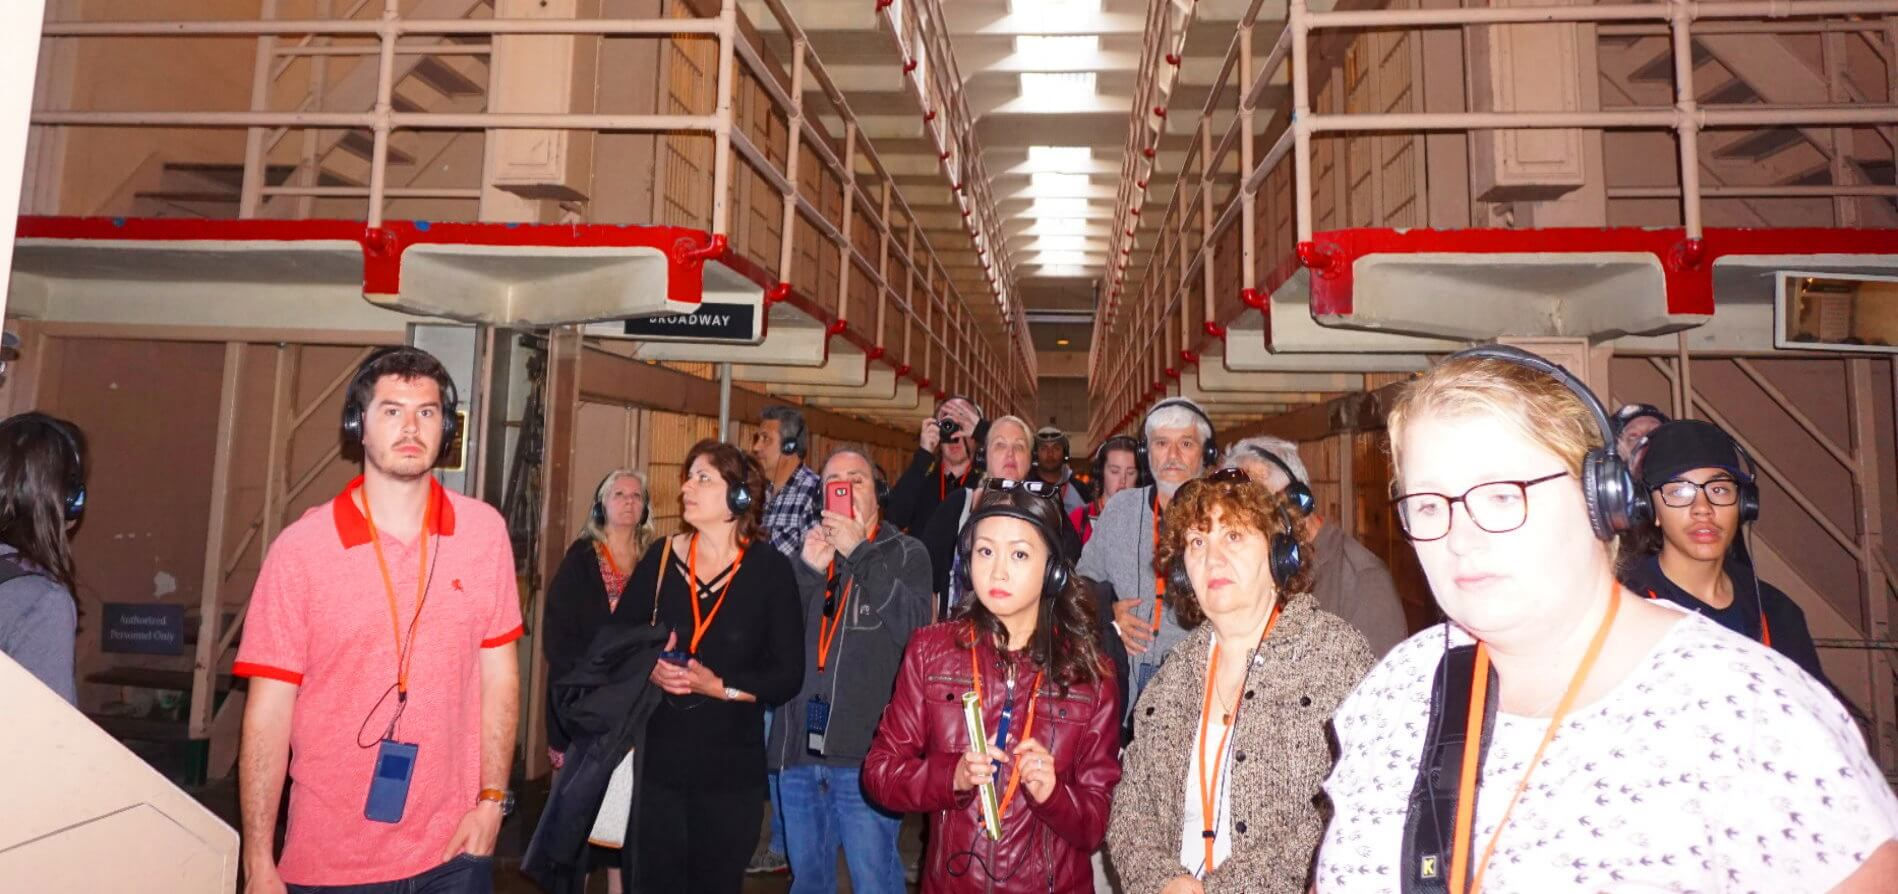 alcatraz-prison-day-audio-guided-tours-vs-jail-night-tour-tickets